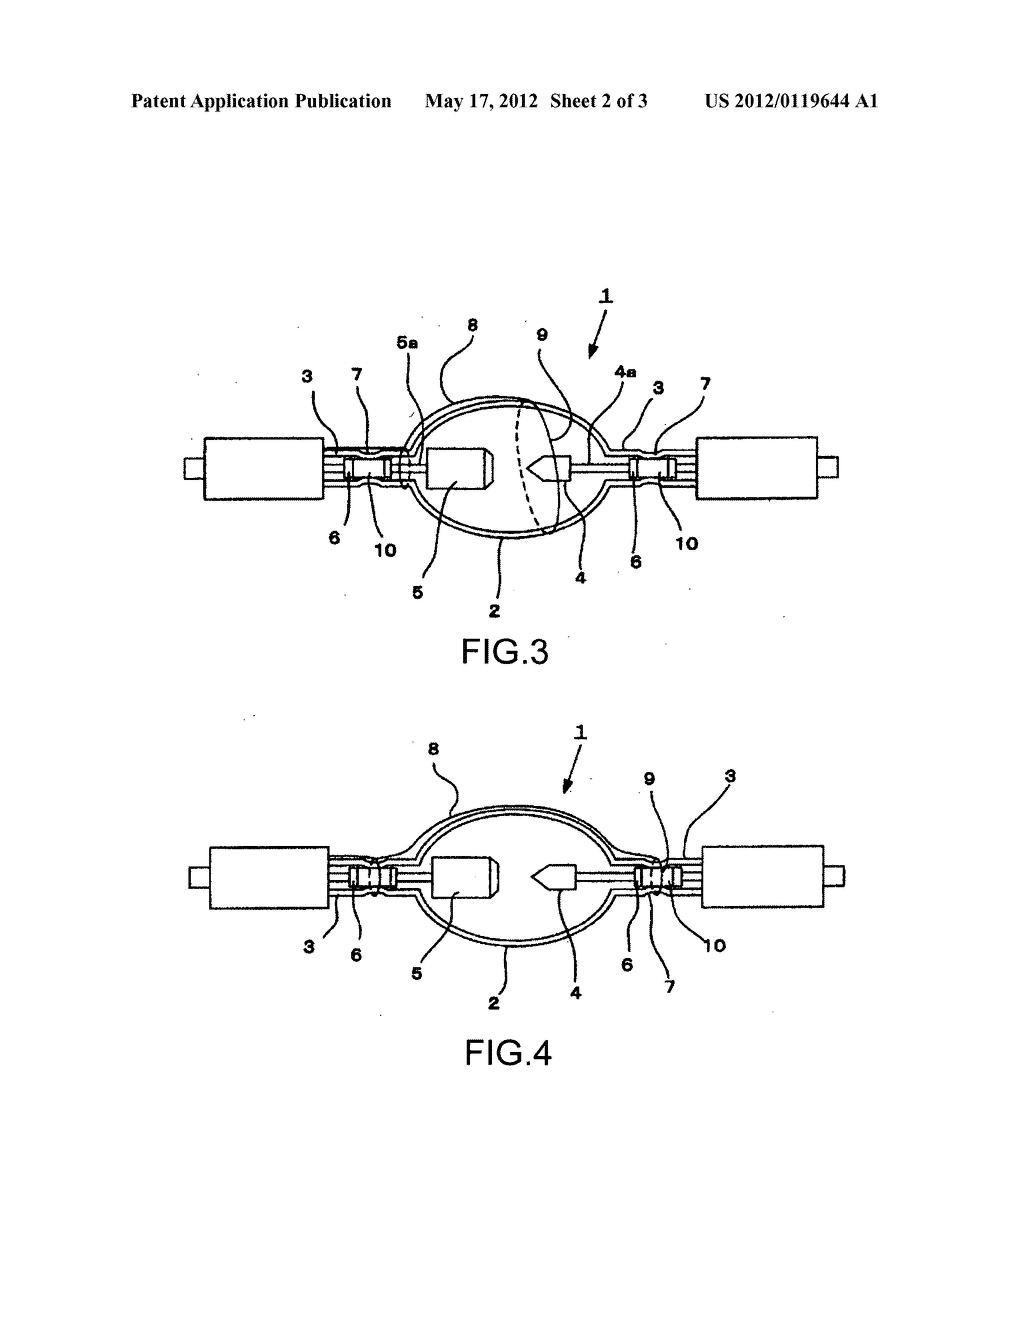 20120119644_03 xenon short arc lamp diagram, schematic, and image 03 xenon diatomic at nearapp.co